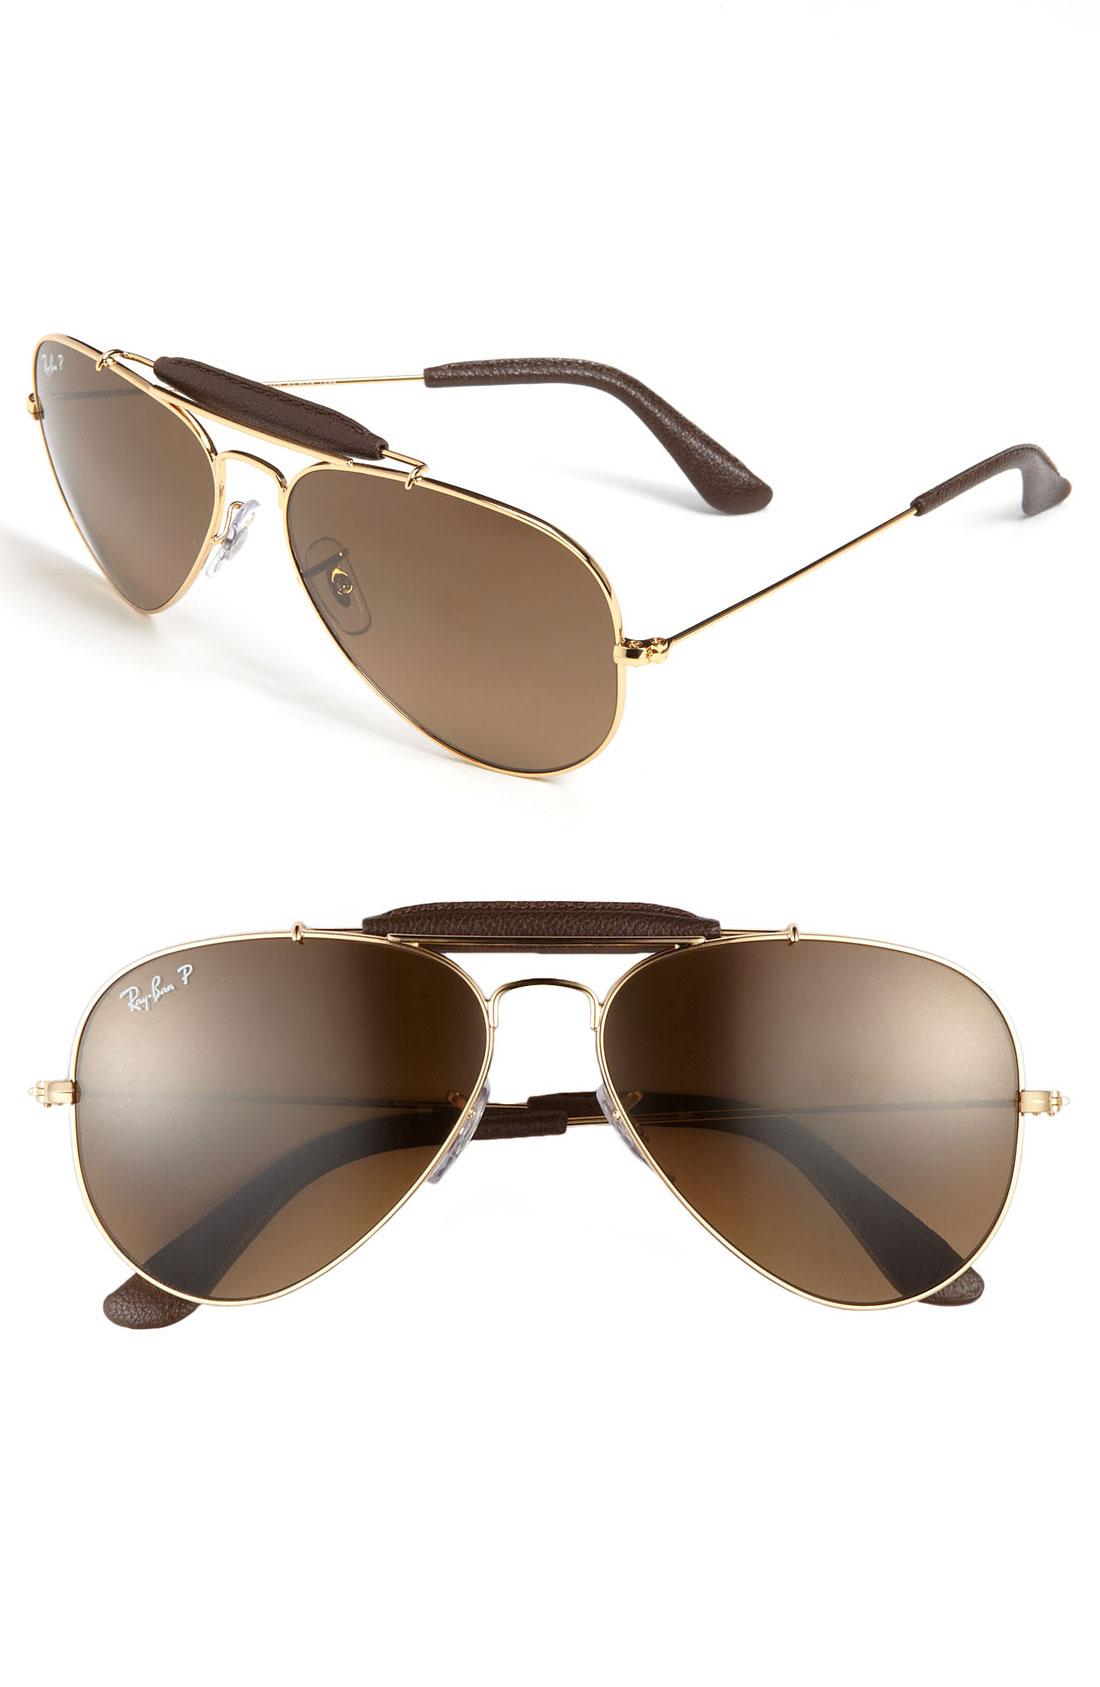 aviator sunglasses uybl  aviator shades sunglasses